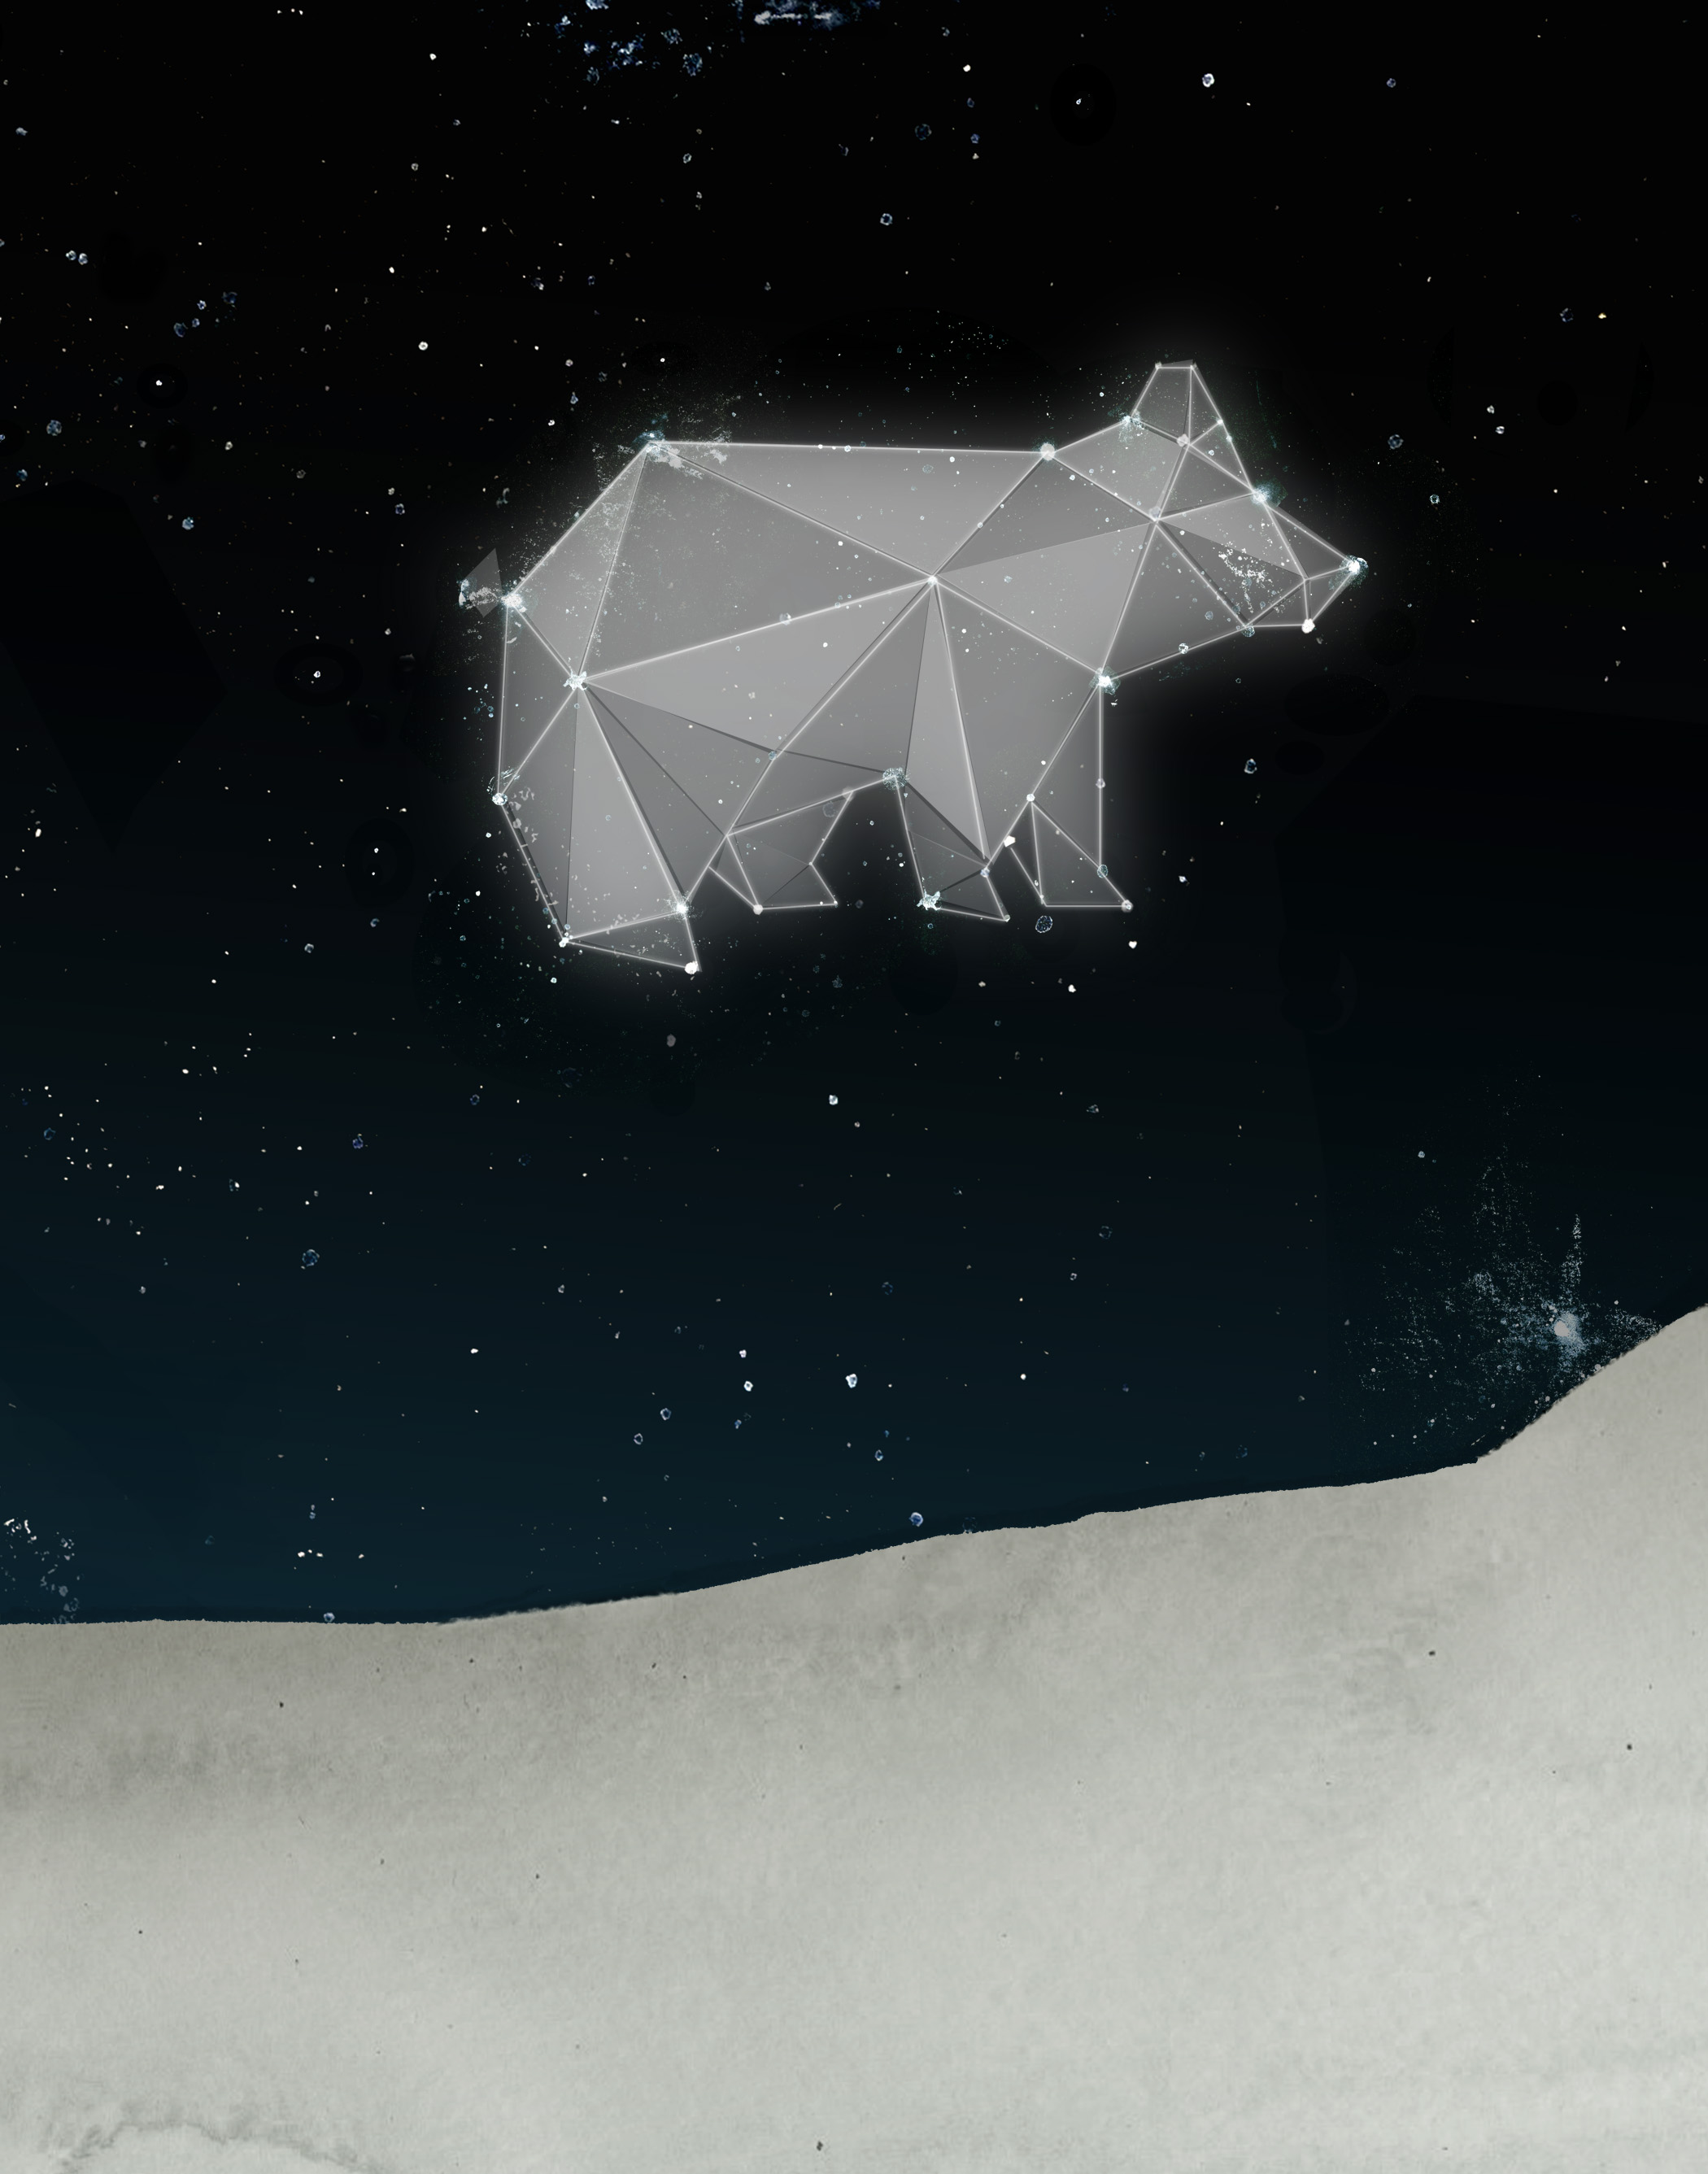 StarBear_01C.jpg